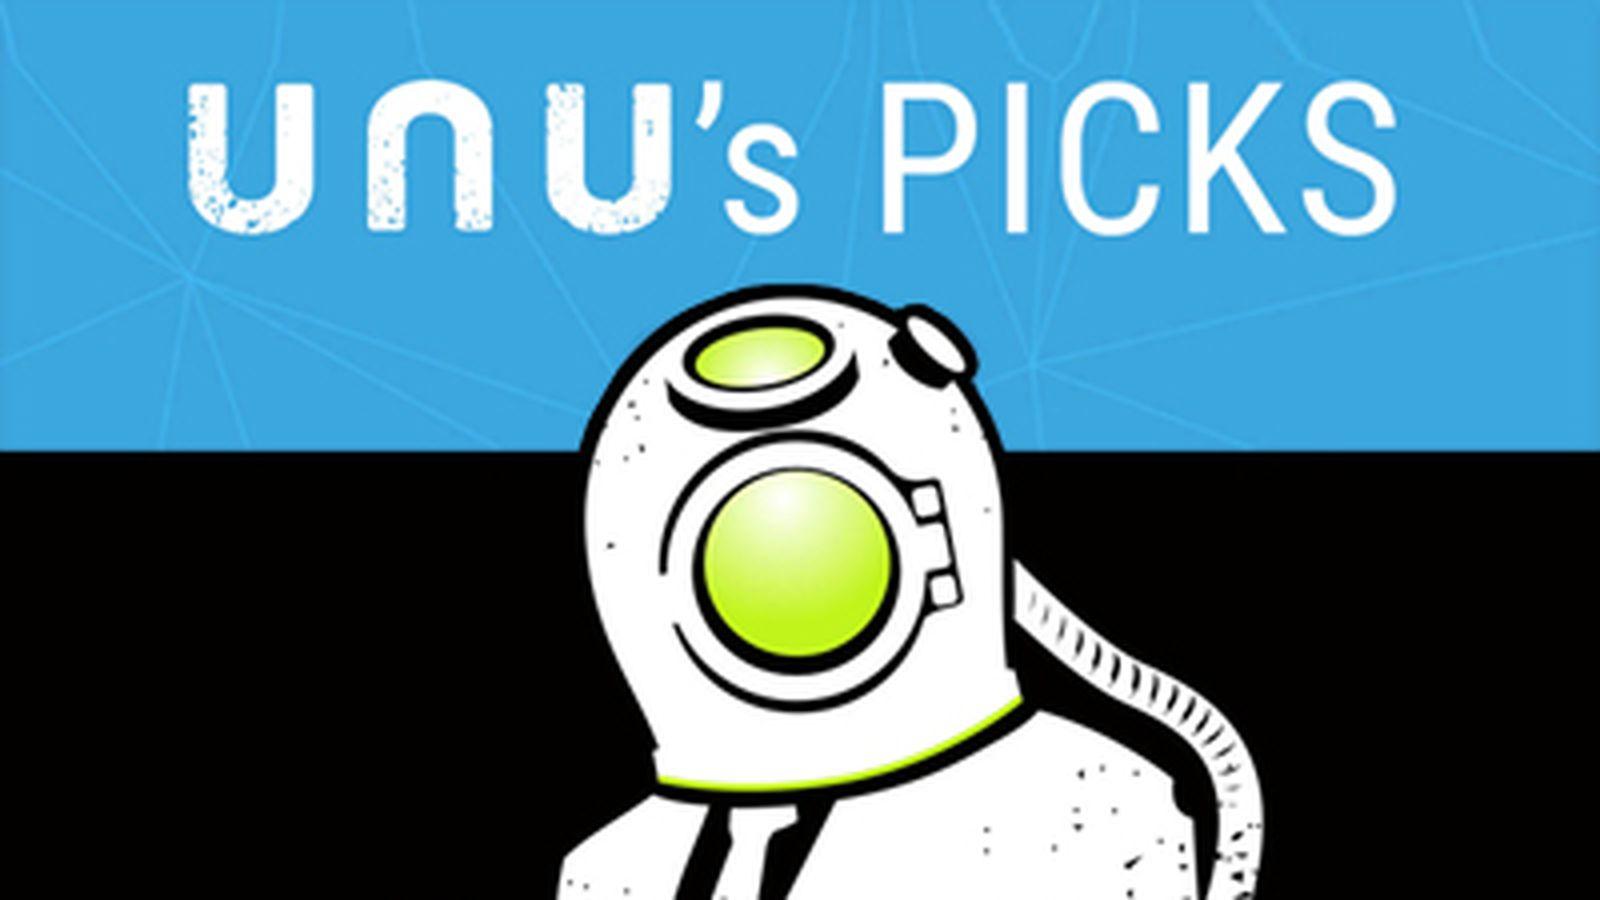 Unus_picks_-_logo.0.0